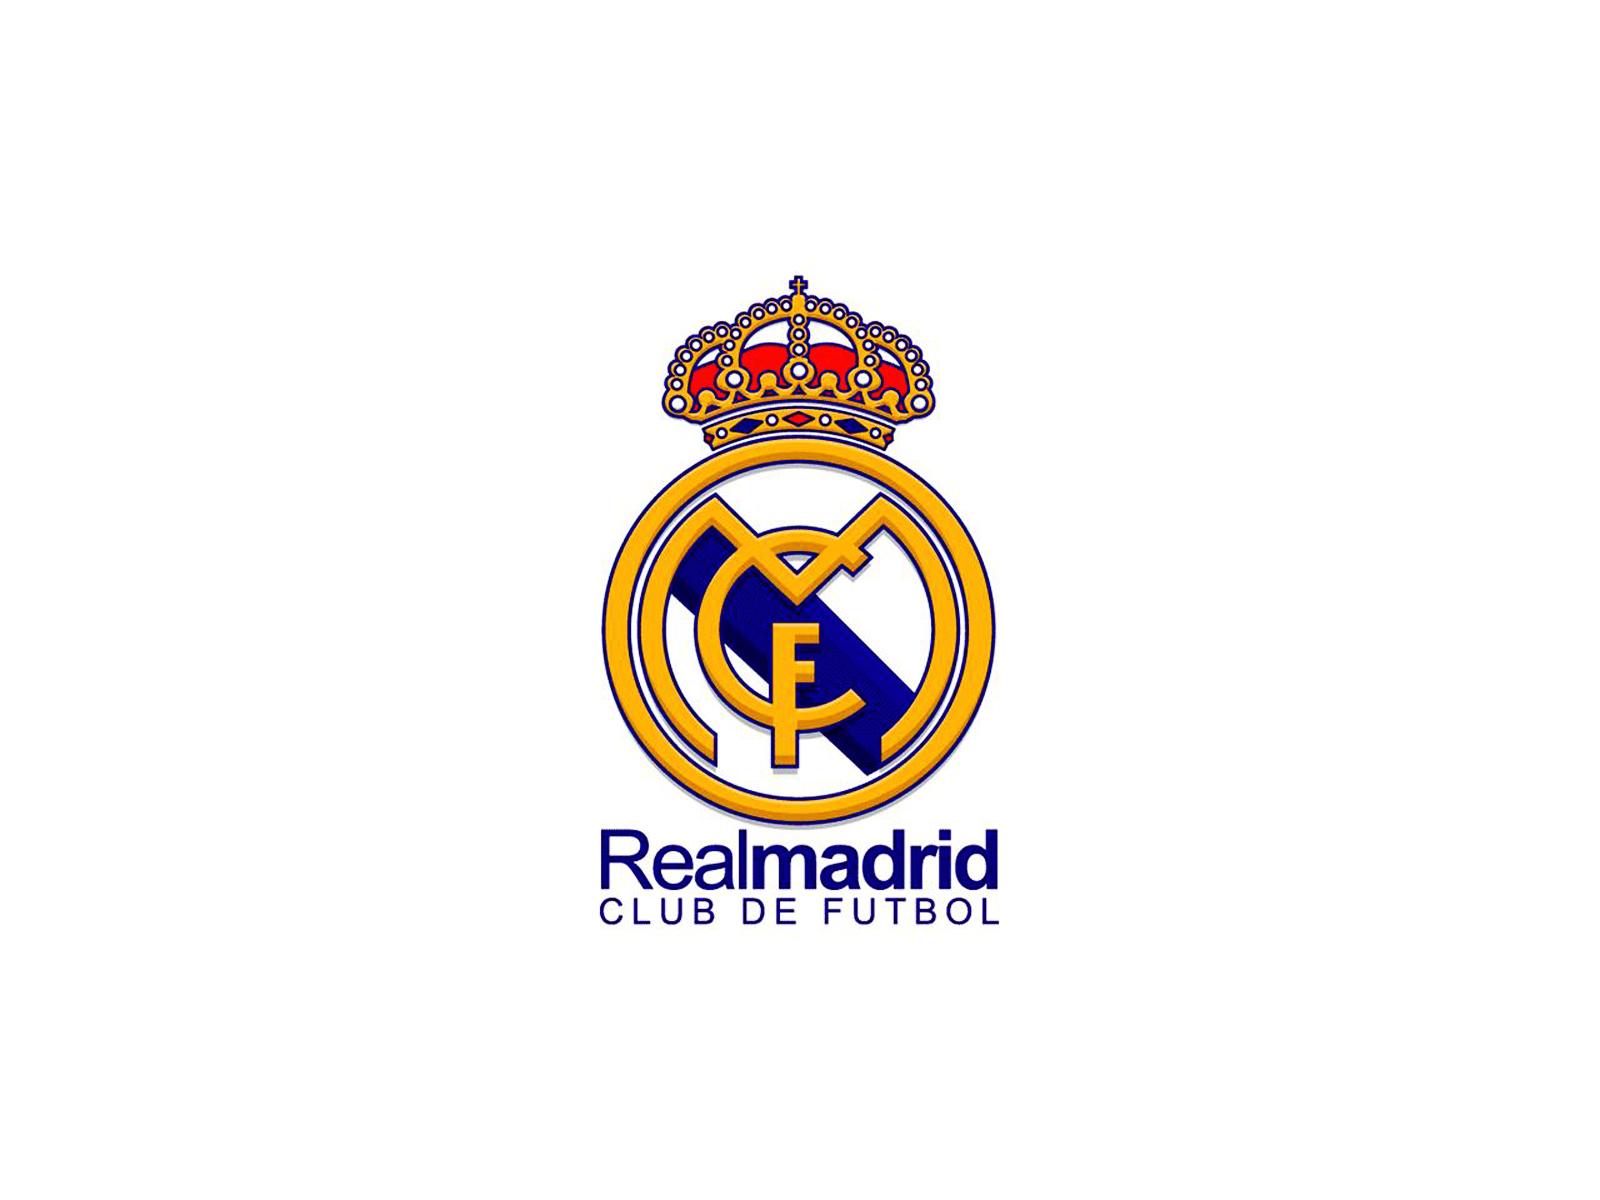 Real Madrid Cf Logo Hd Desktop Wallpapers Hd Wallpapers